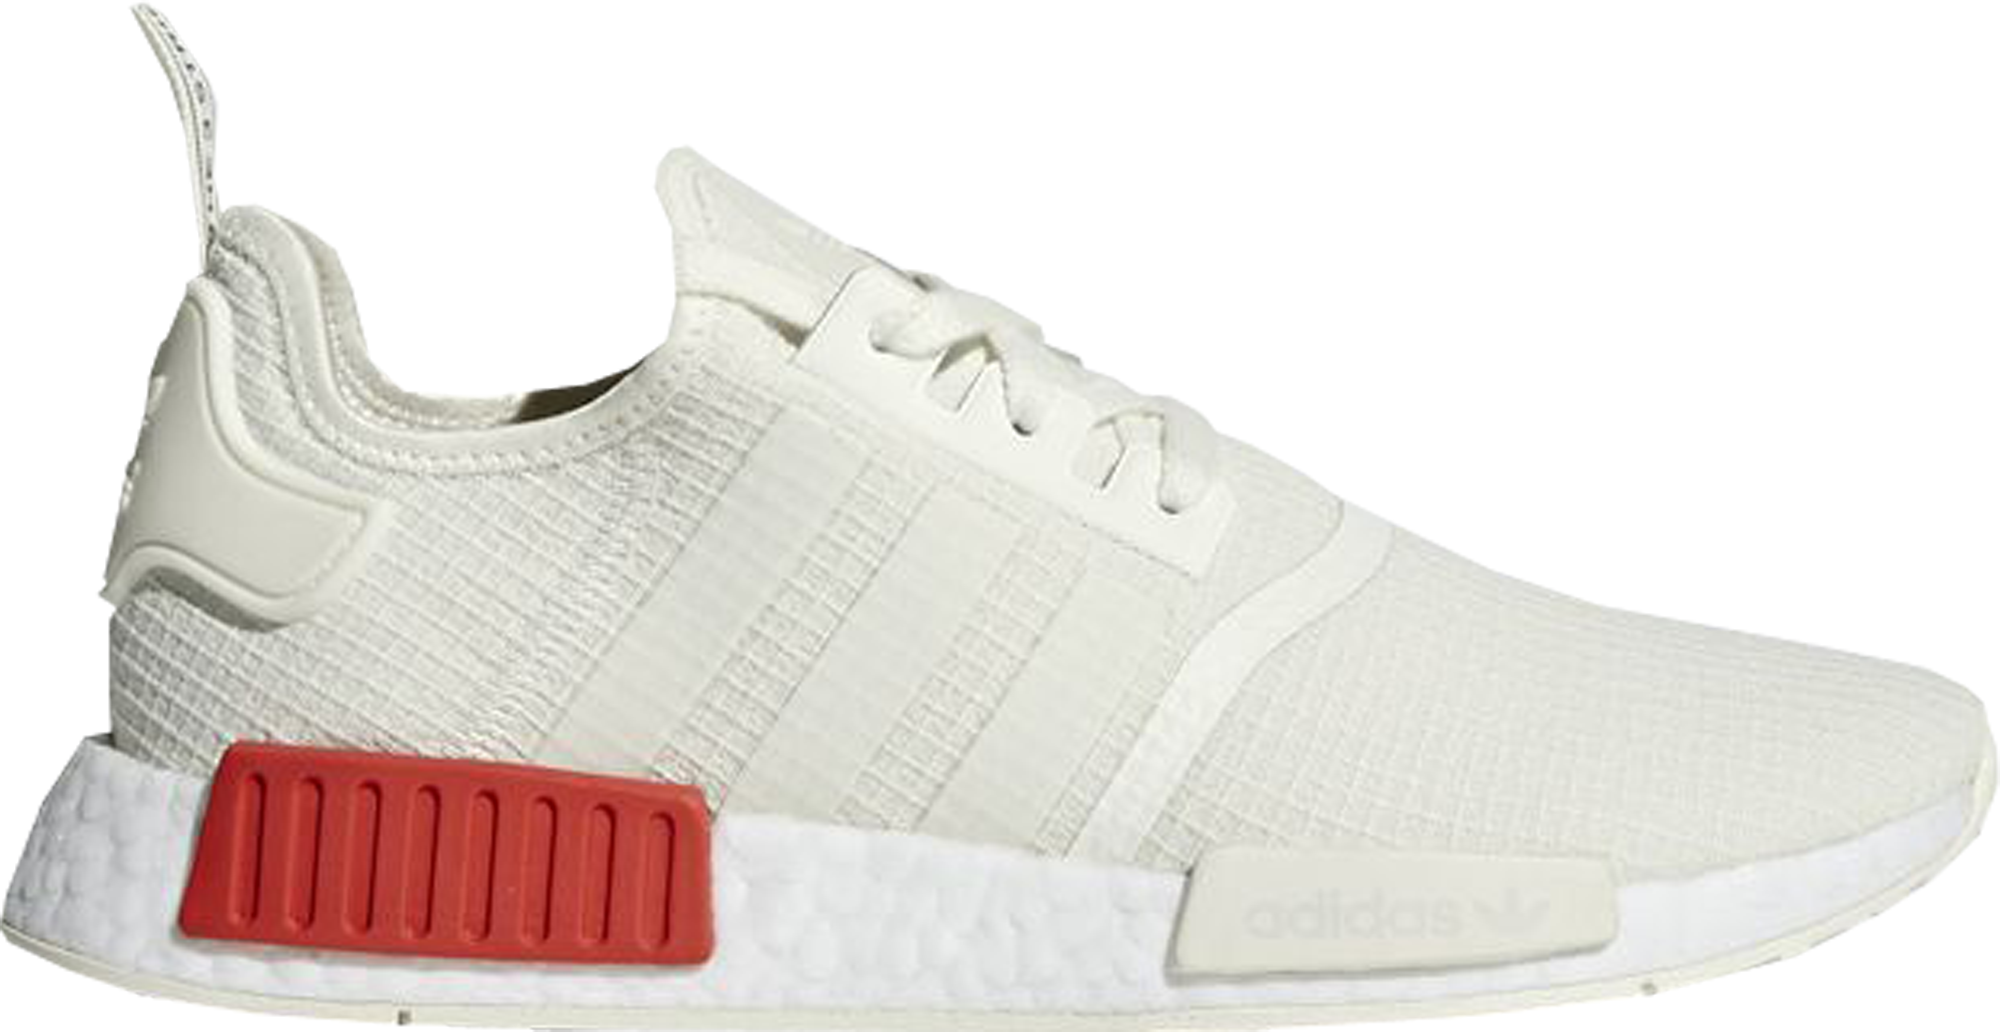 e5296c00bb74c ... 50% off adidas nmd r1 off white lush red 0808a 88fb1 ...